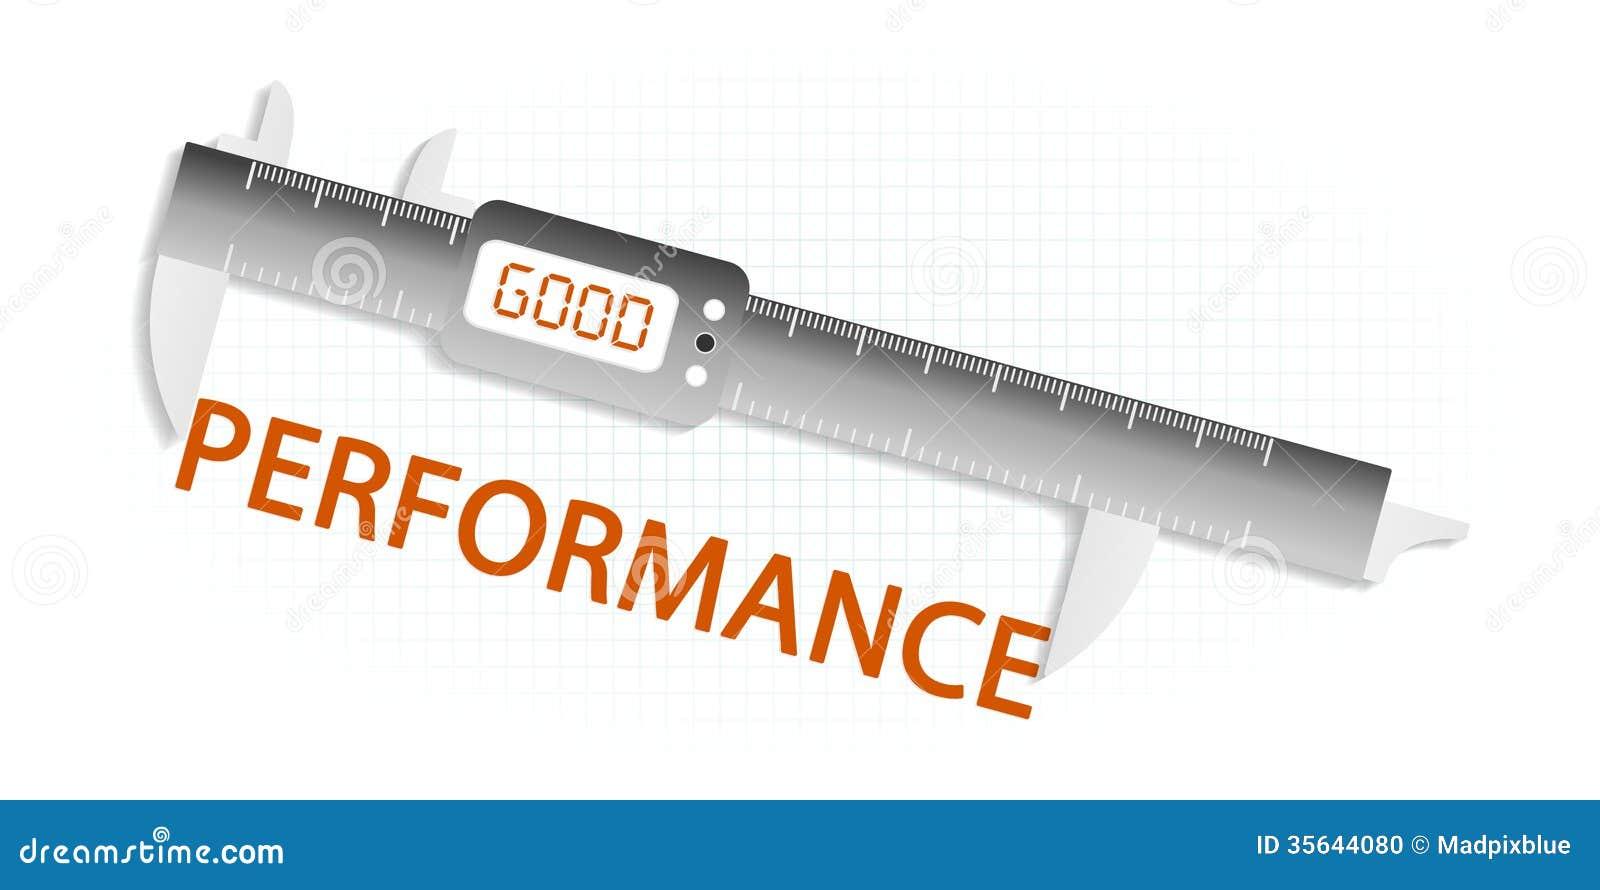 Good performance precision measuring tool concept.